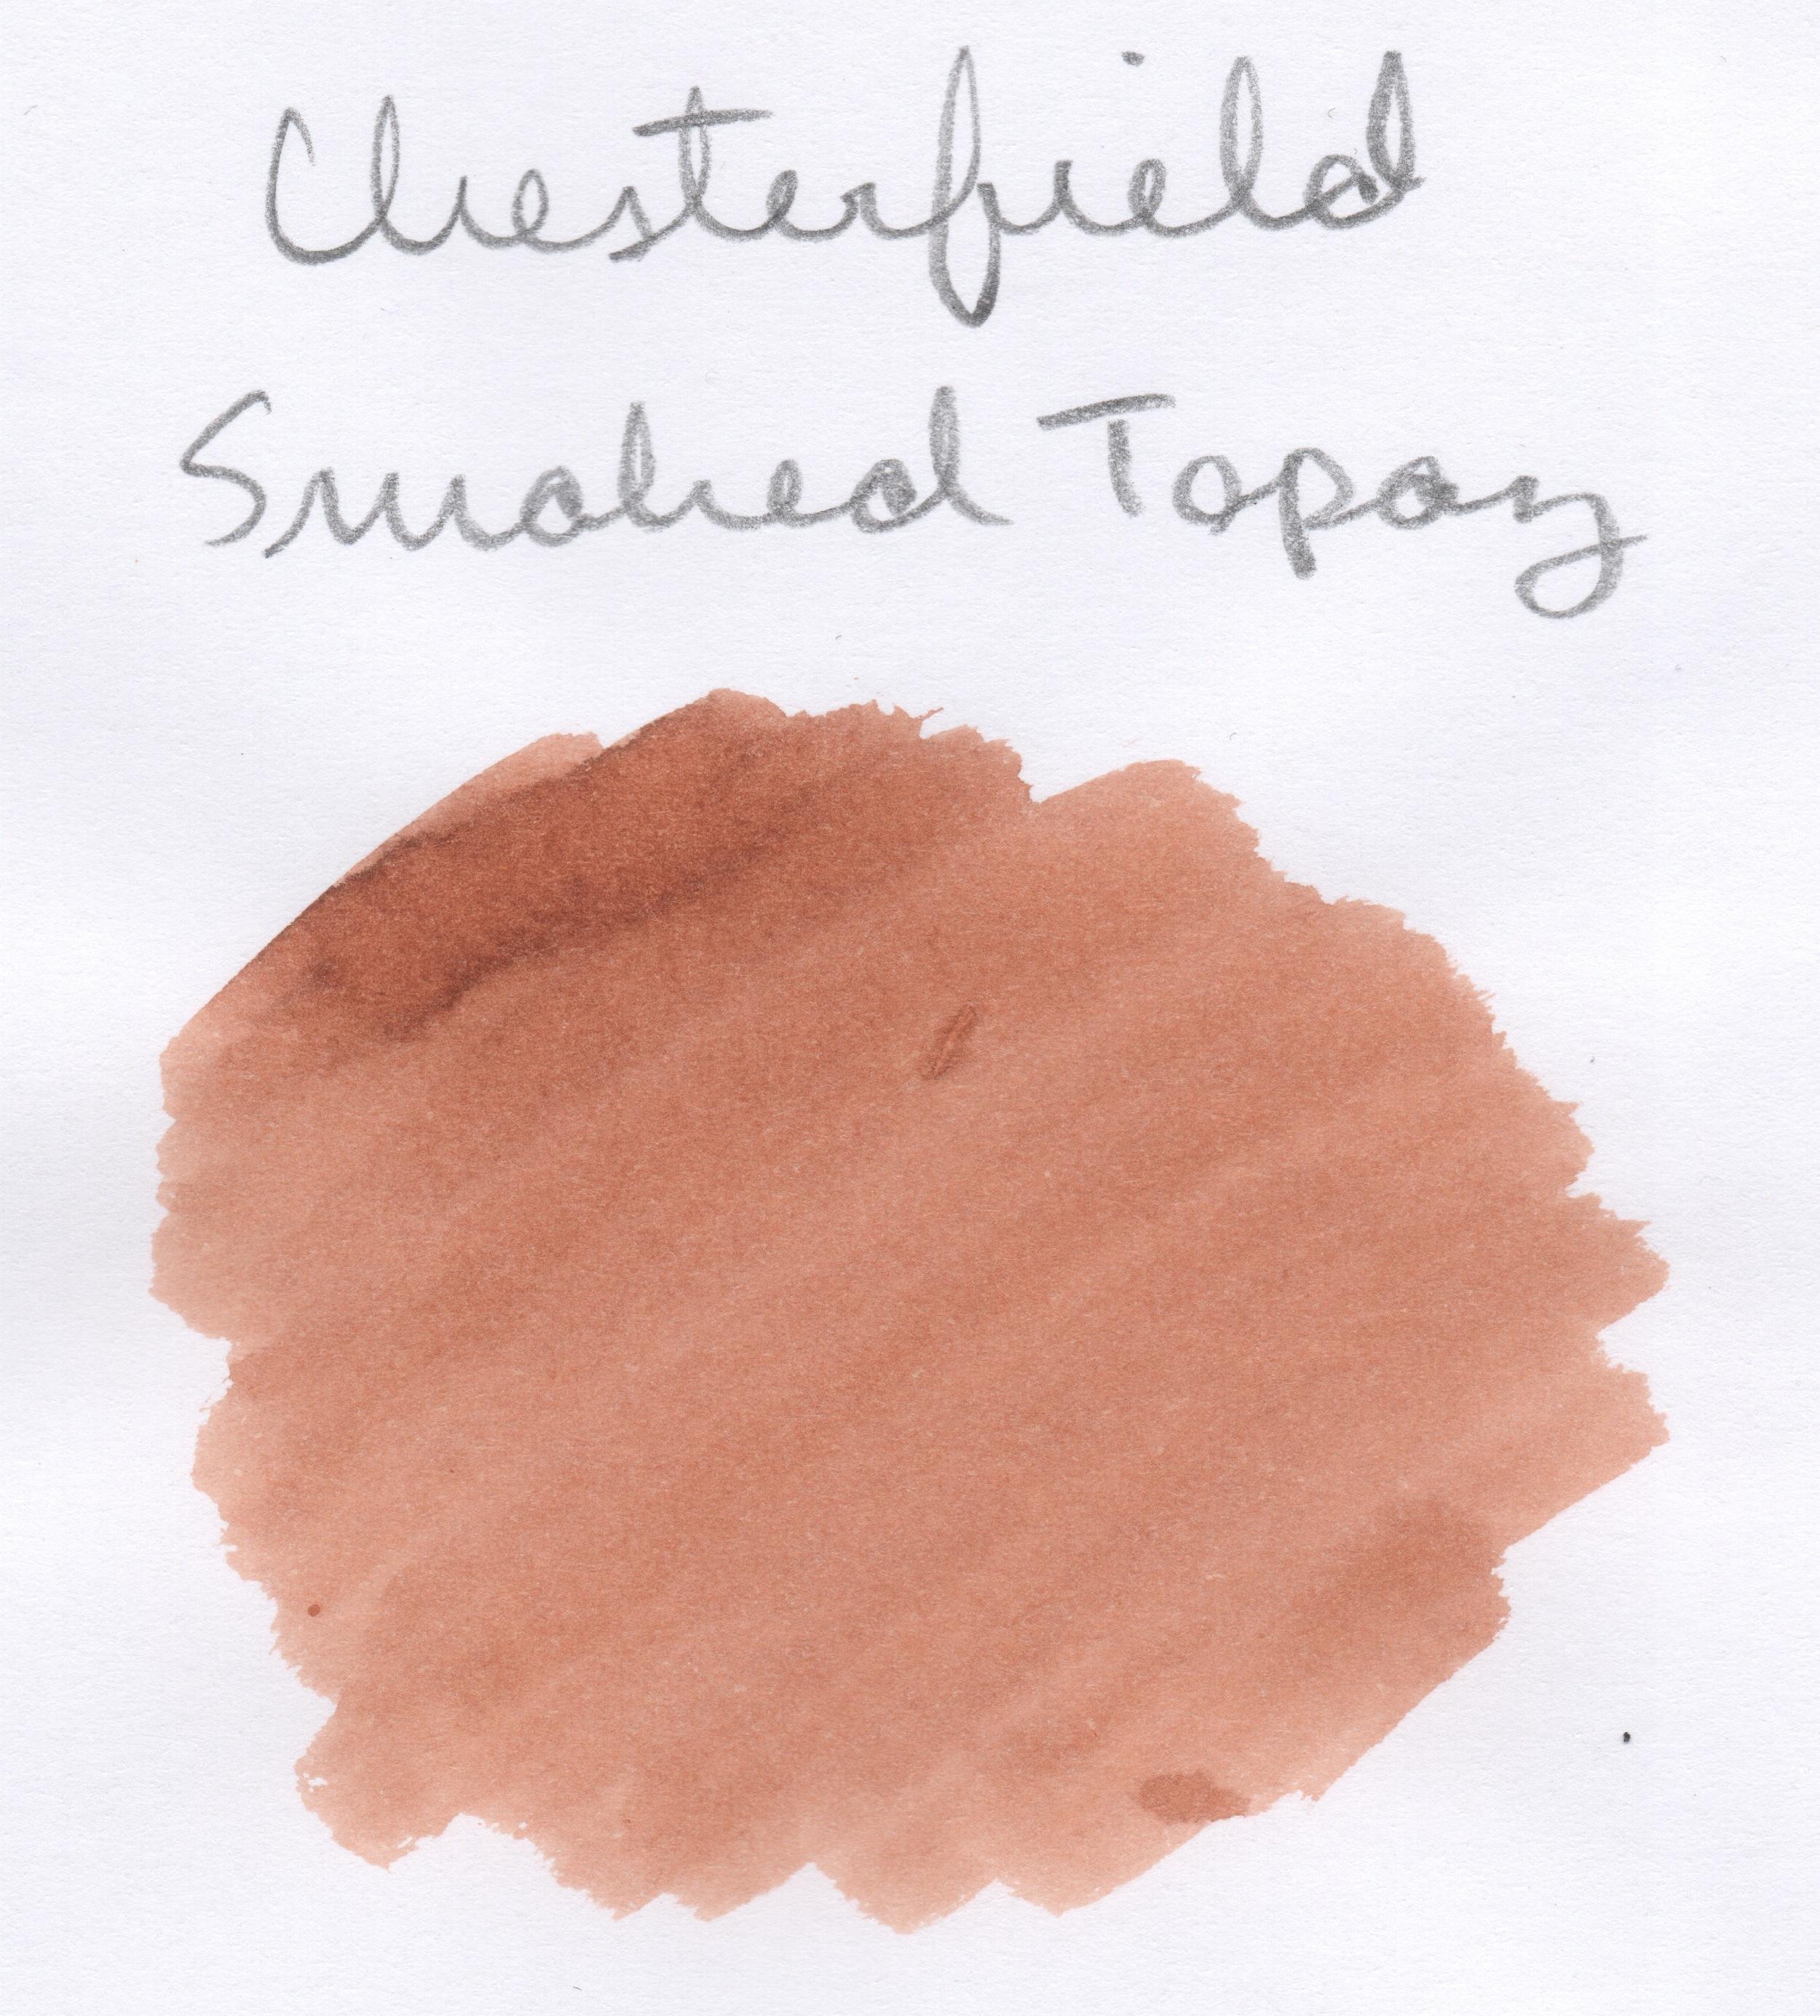 Chesterfield Smoked Topaz.jpeg